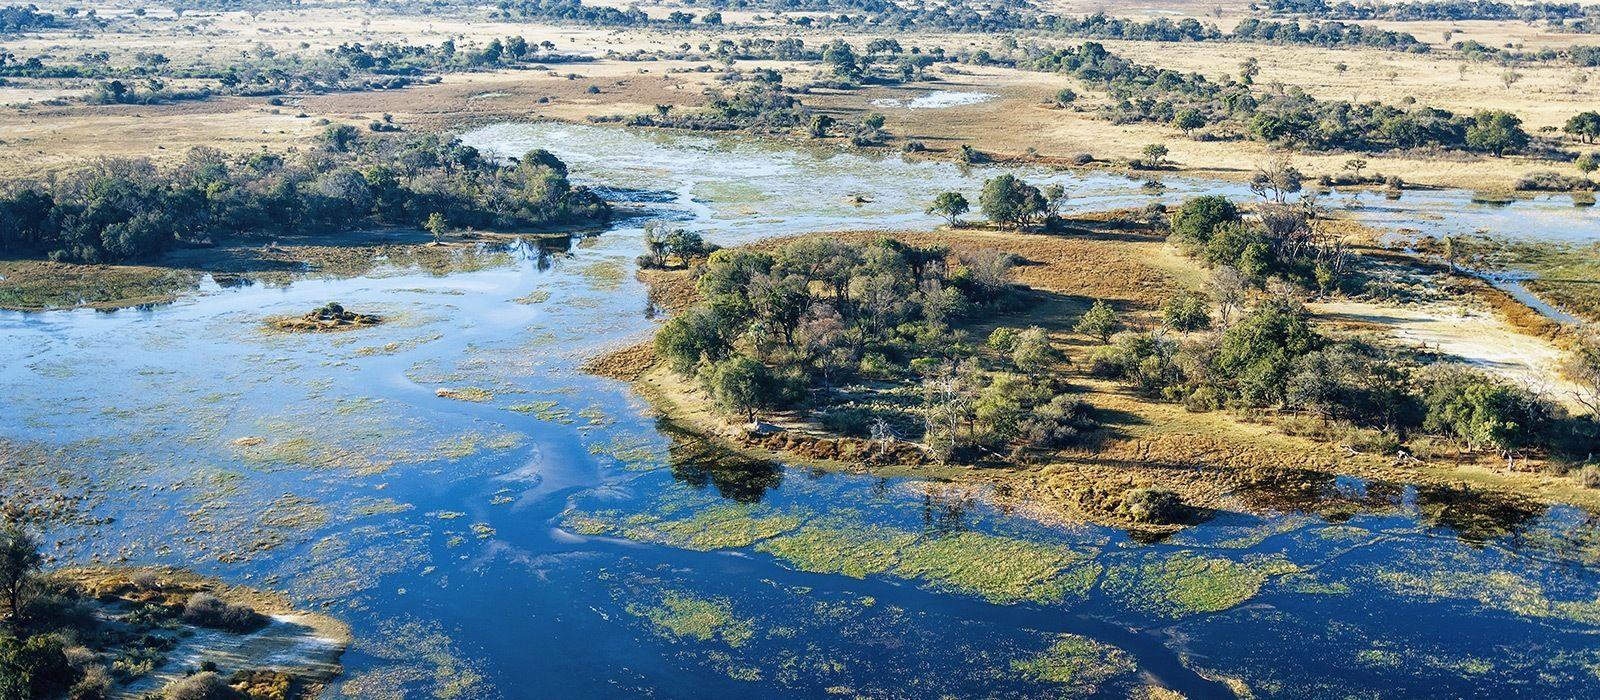 Victoria Falls and Botswana Highlights Tour Trip 3